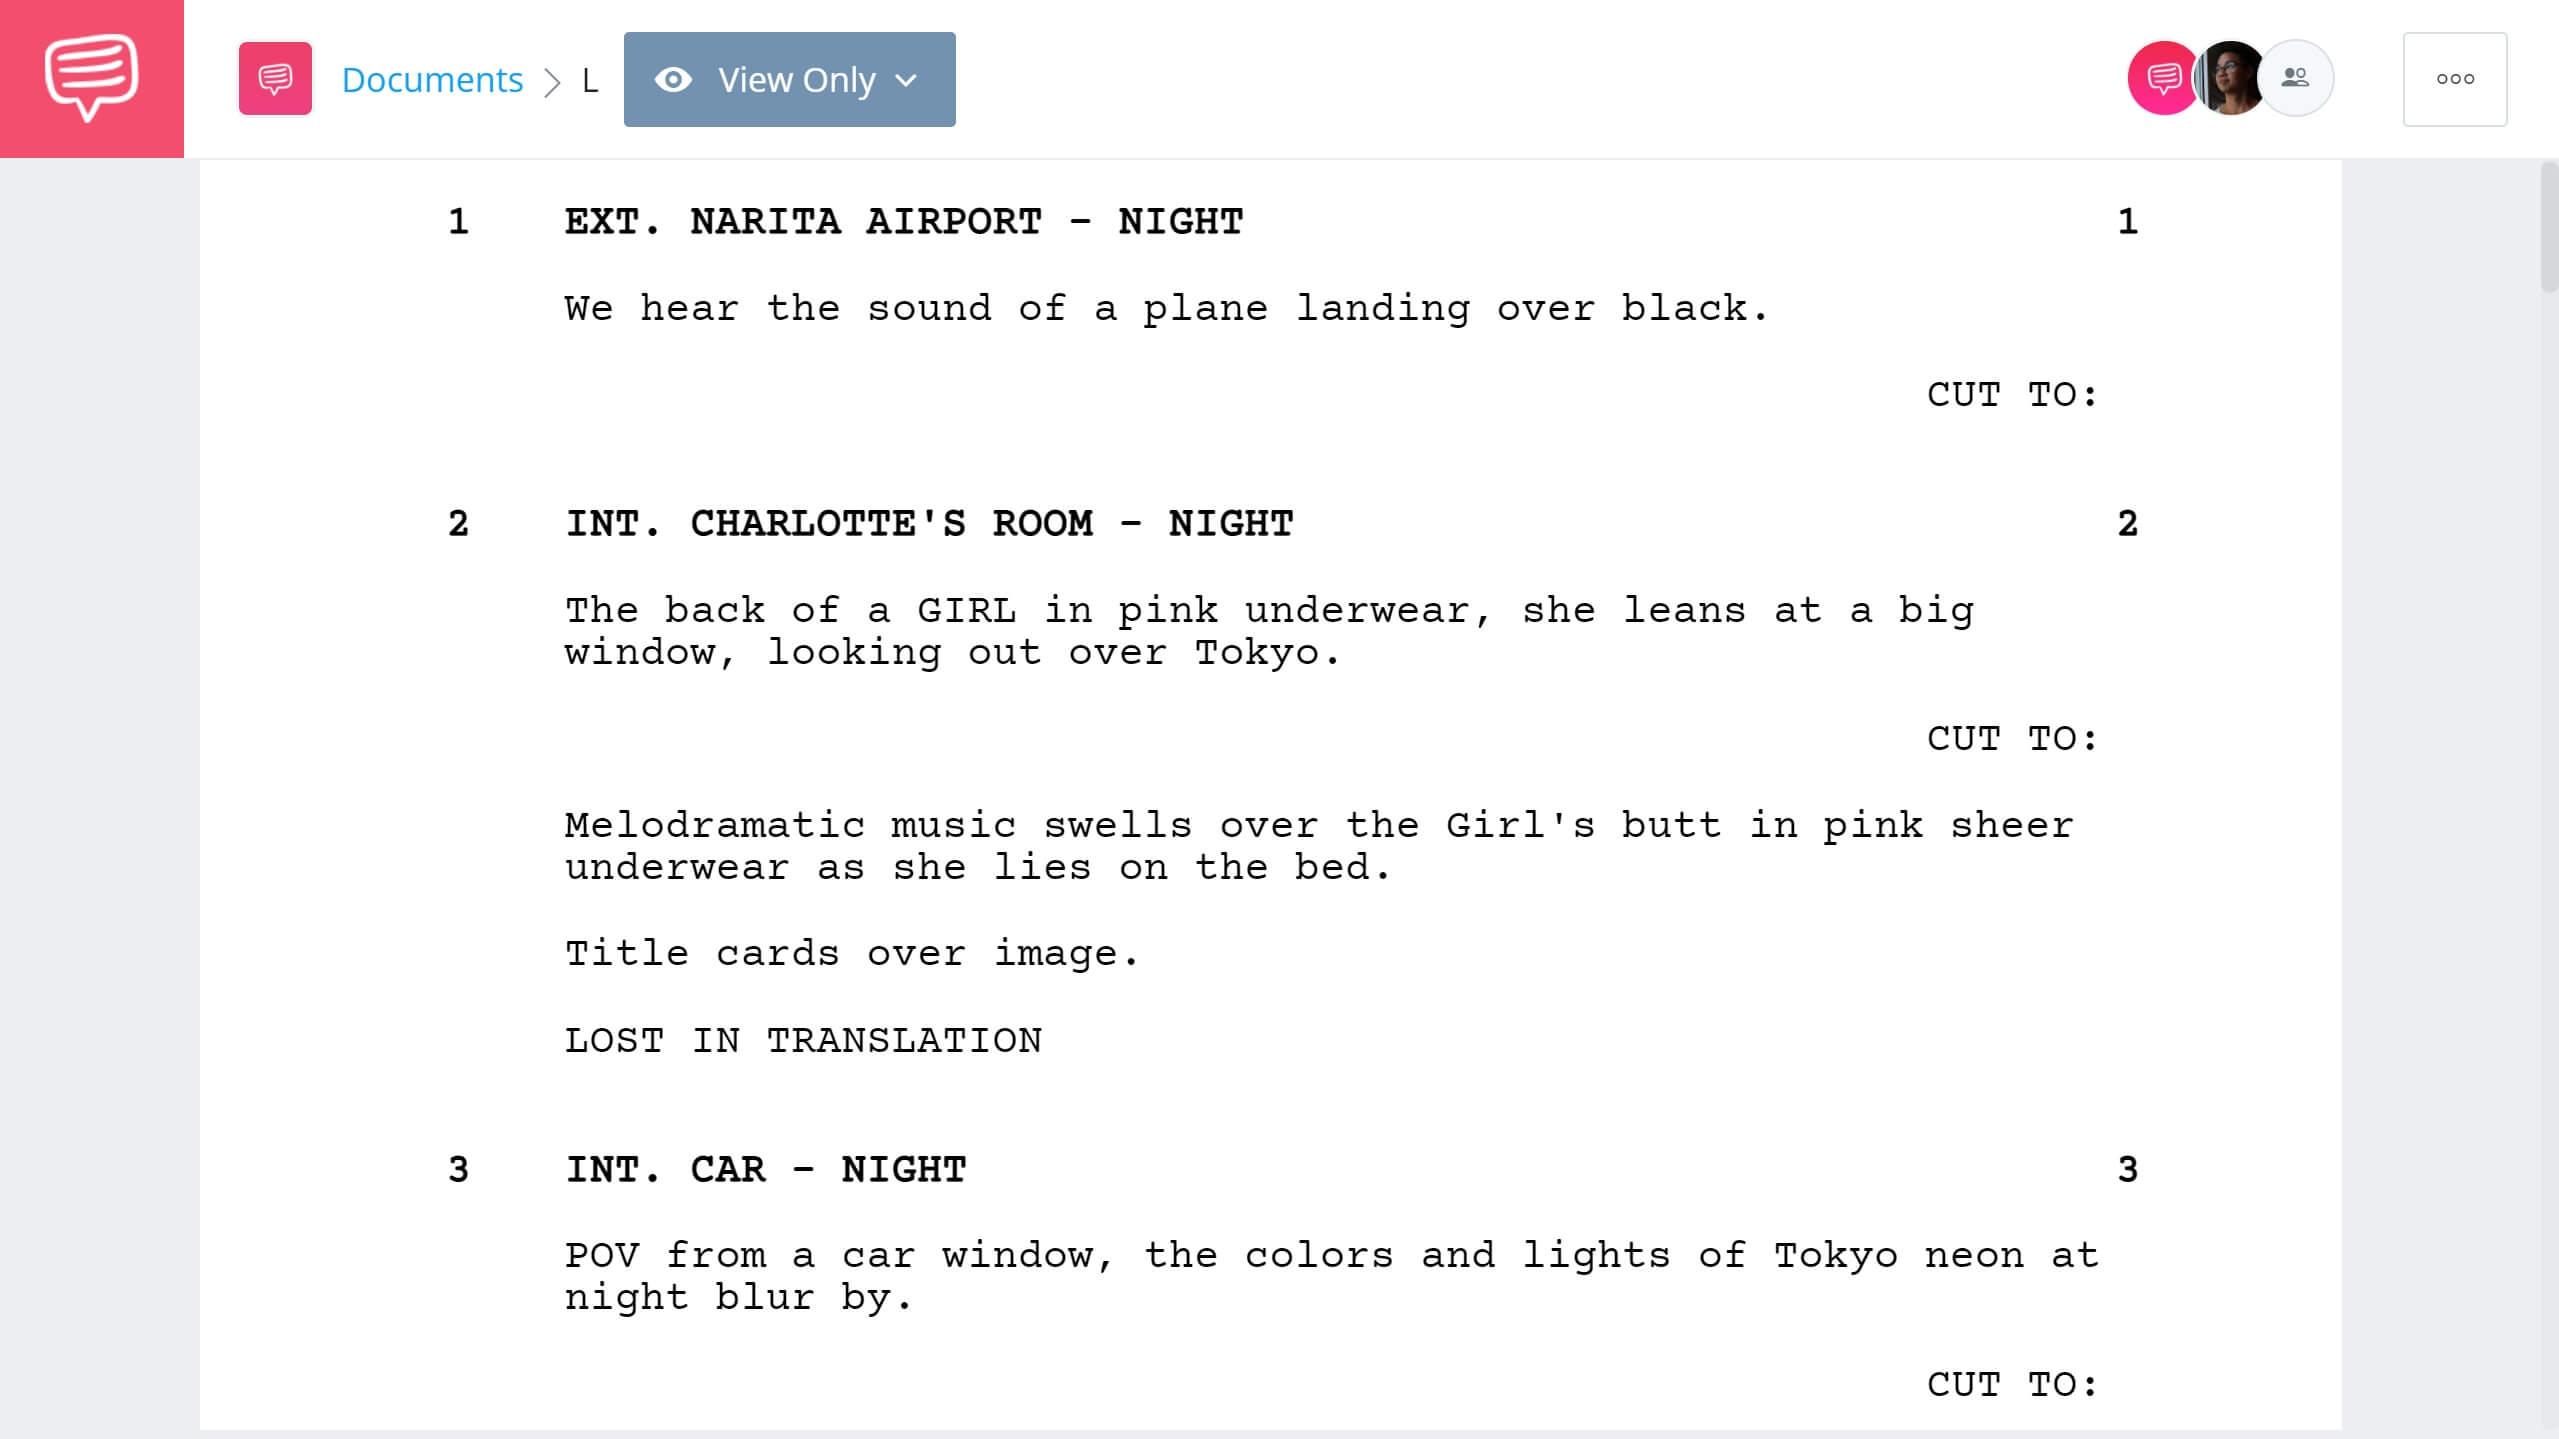 Best Original Screenplay Academy Award - Lost in Translation Full Script PDF Download - StudioBinder Screenwriting Software